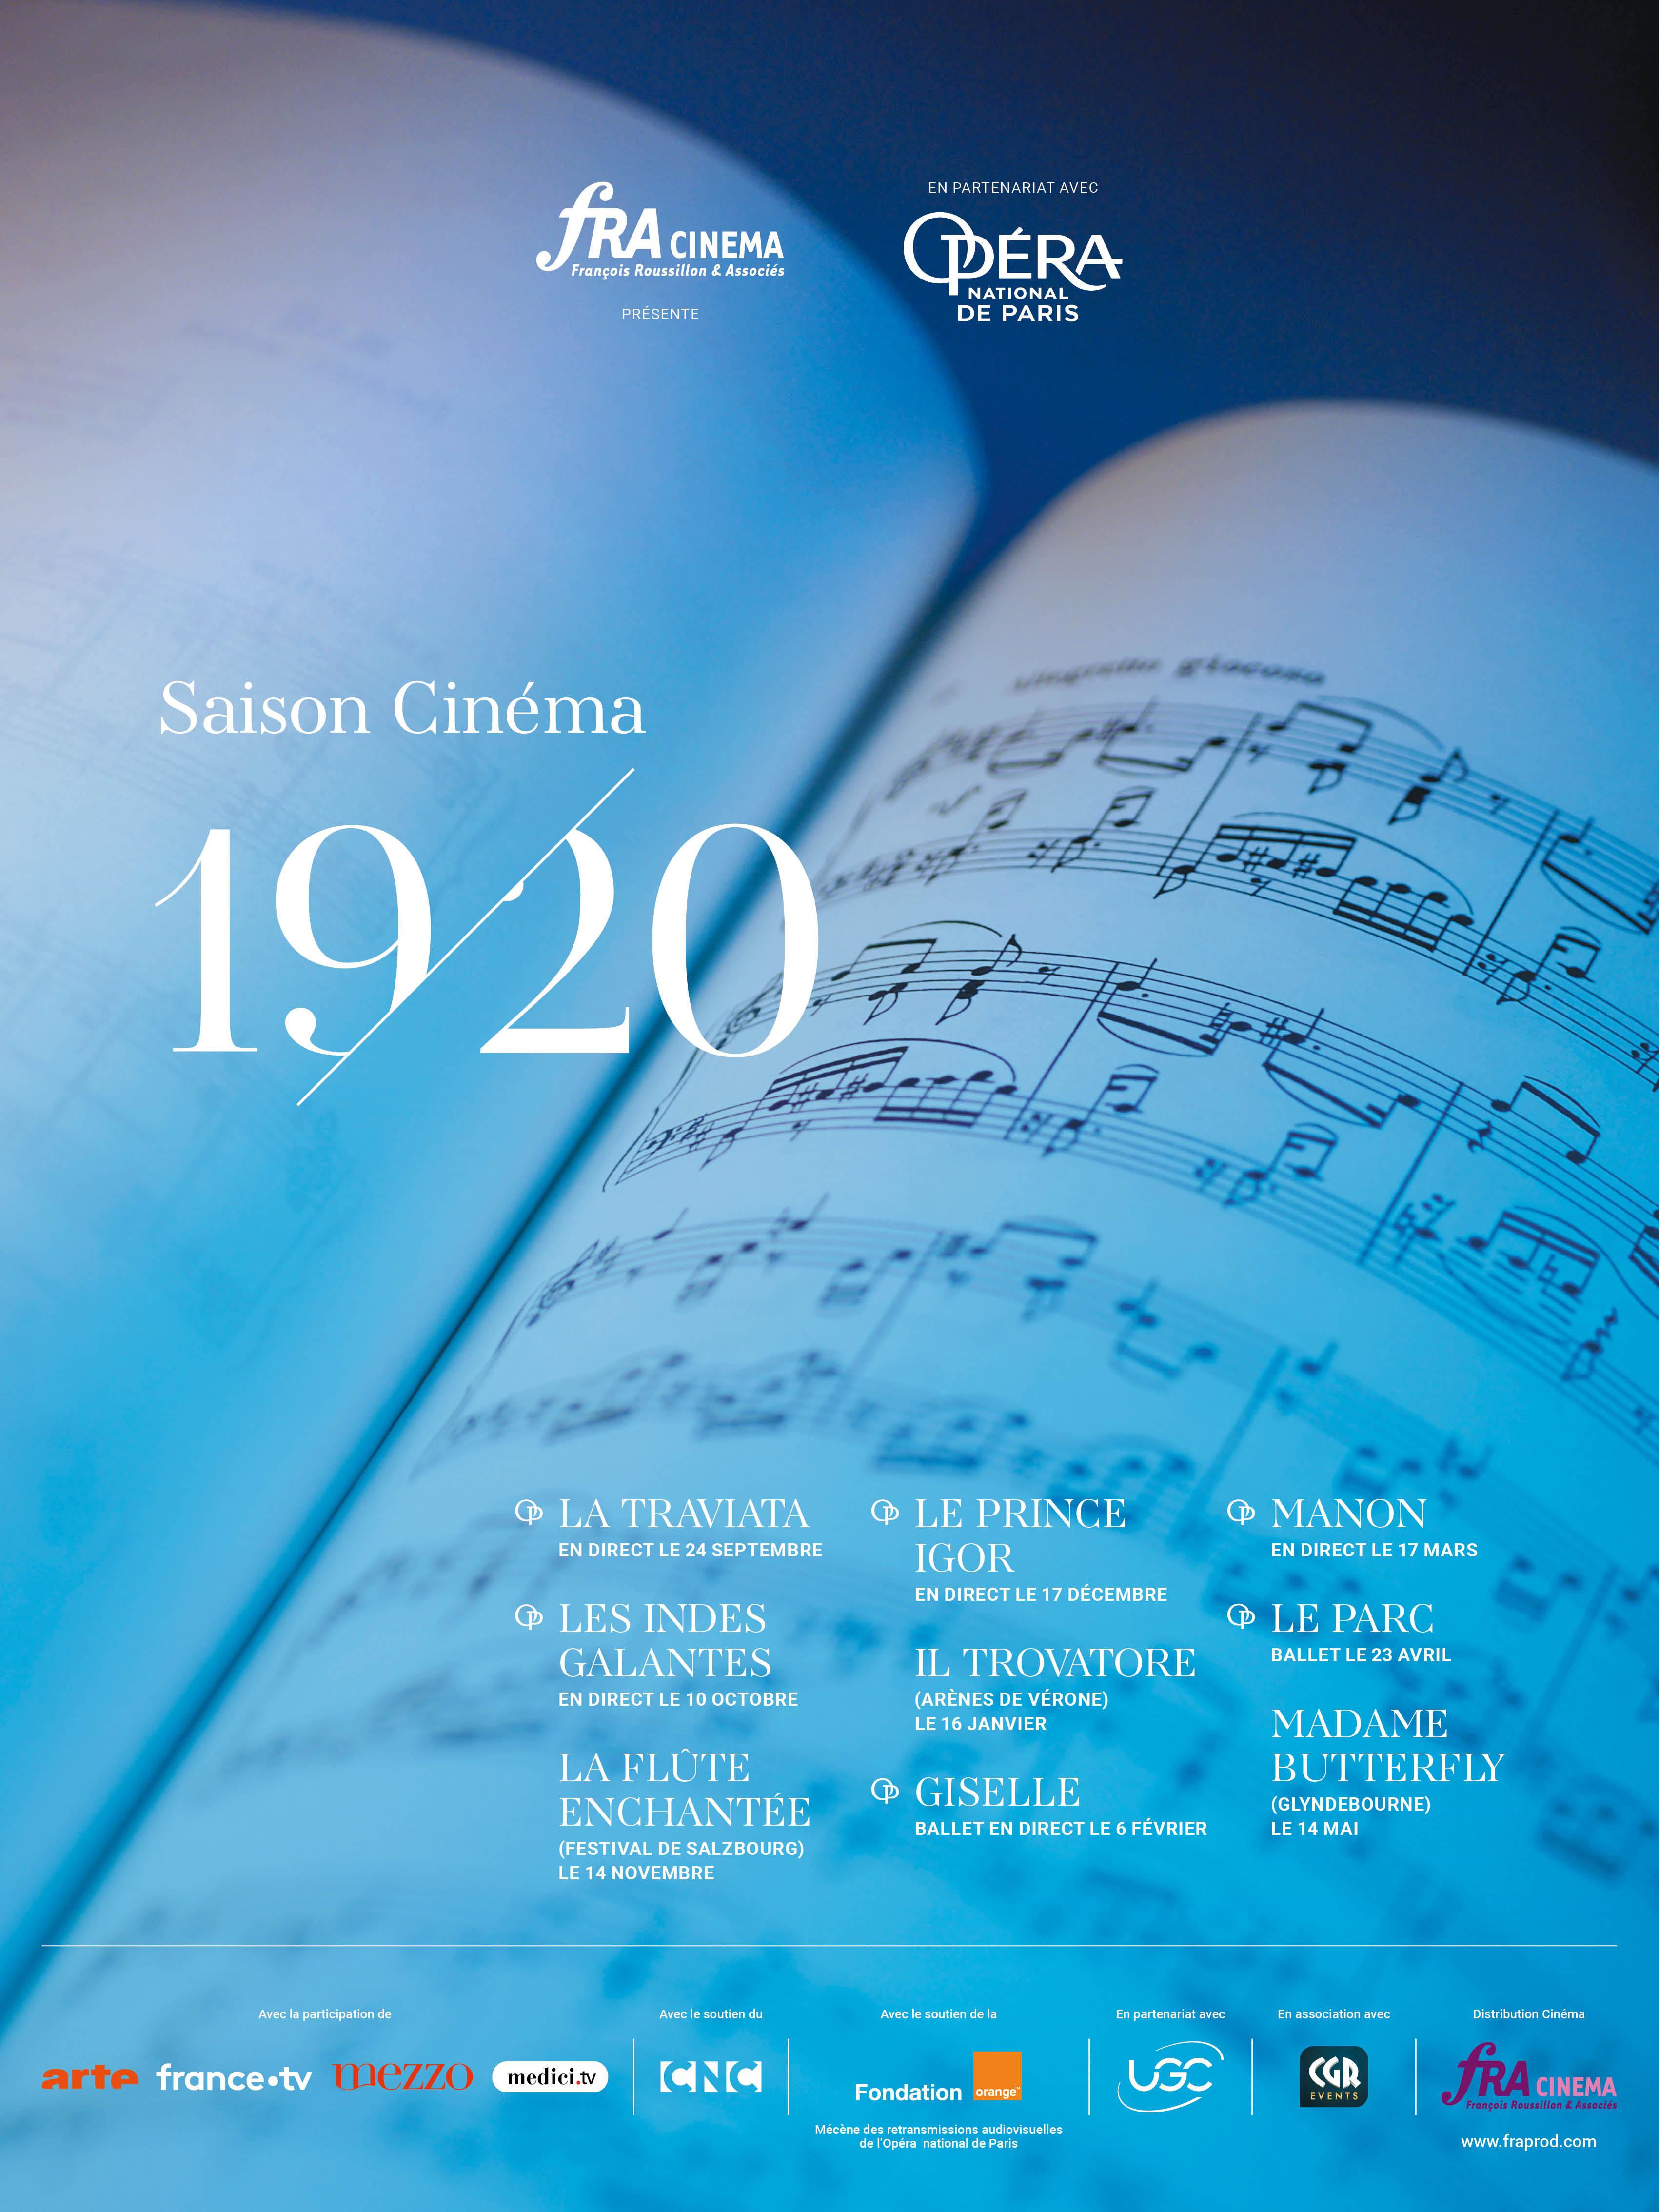 Image du film Le Prince Igor (Opéra de Paris-FRA Cinéma)